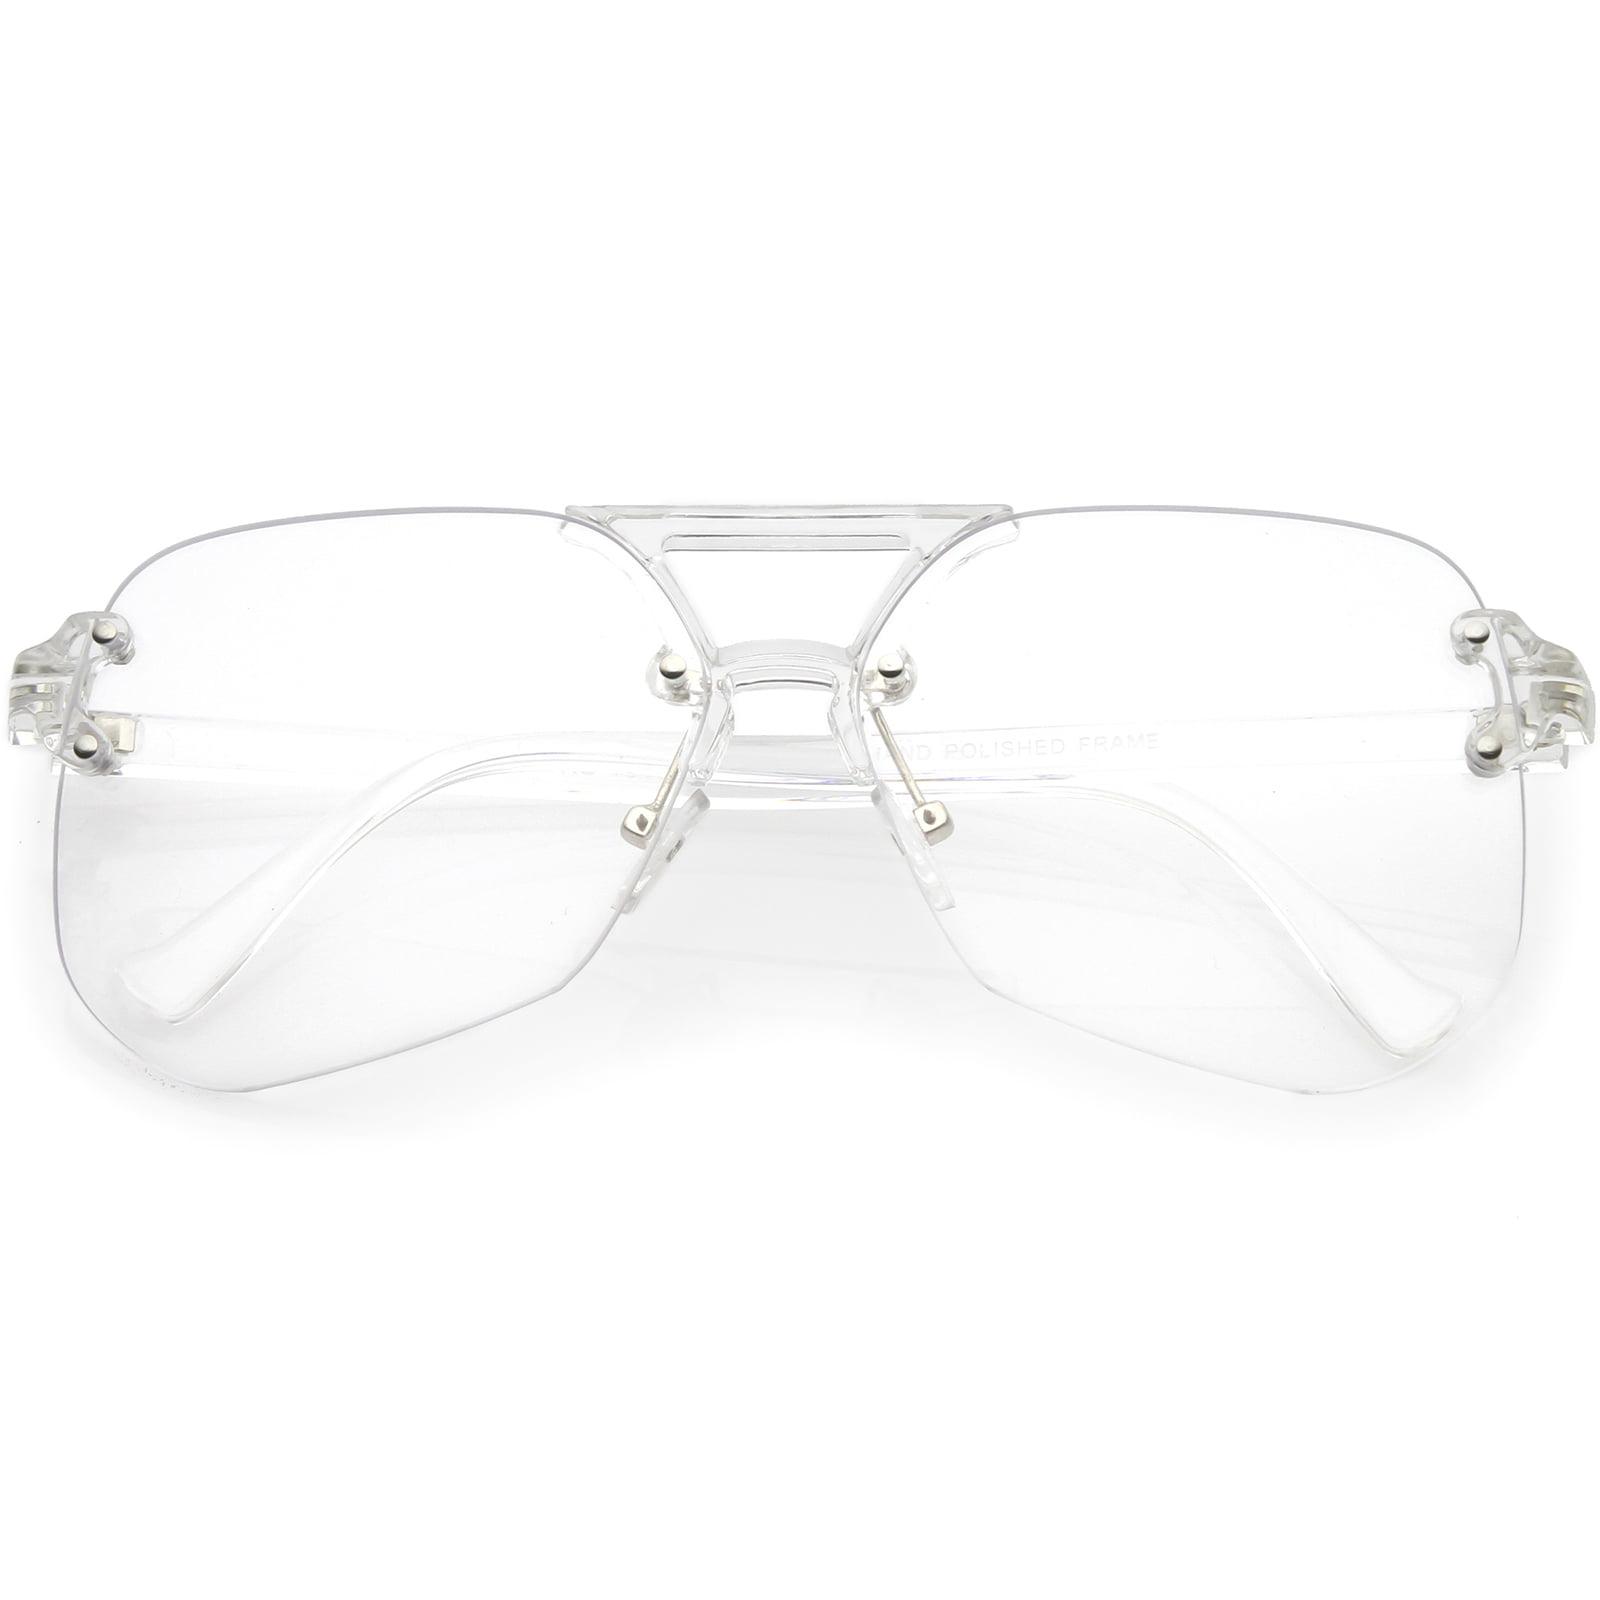 clear sunglasses walmart Oakley Ice Iridium Polarized Lenses product image oversize rimless aviator sunglasses with keyhole bridge super flat lens 60mm clear clear